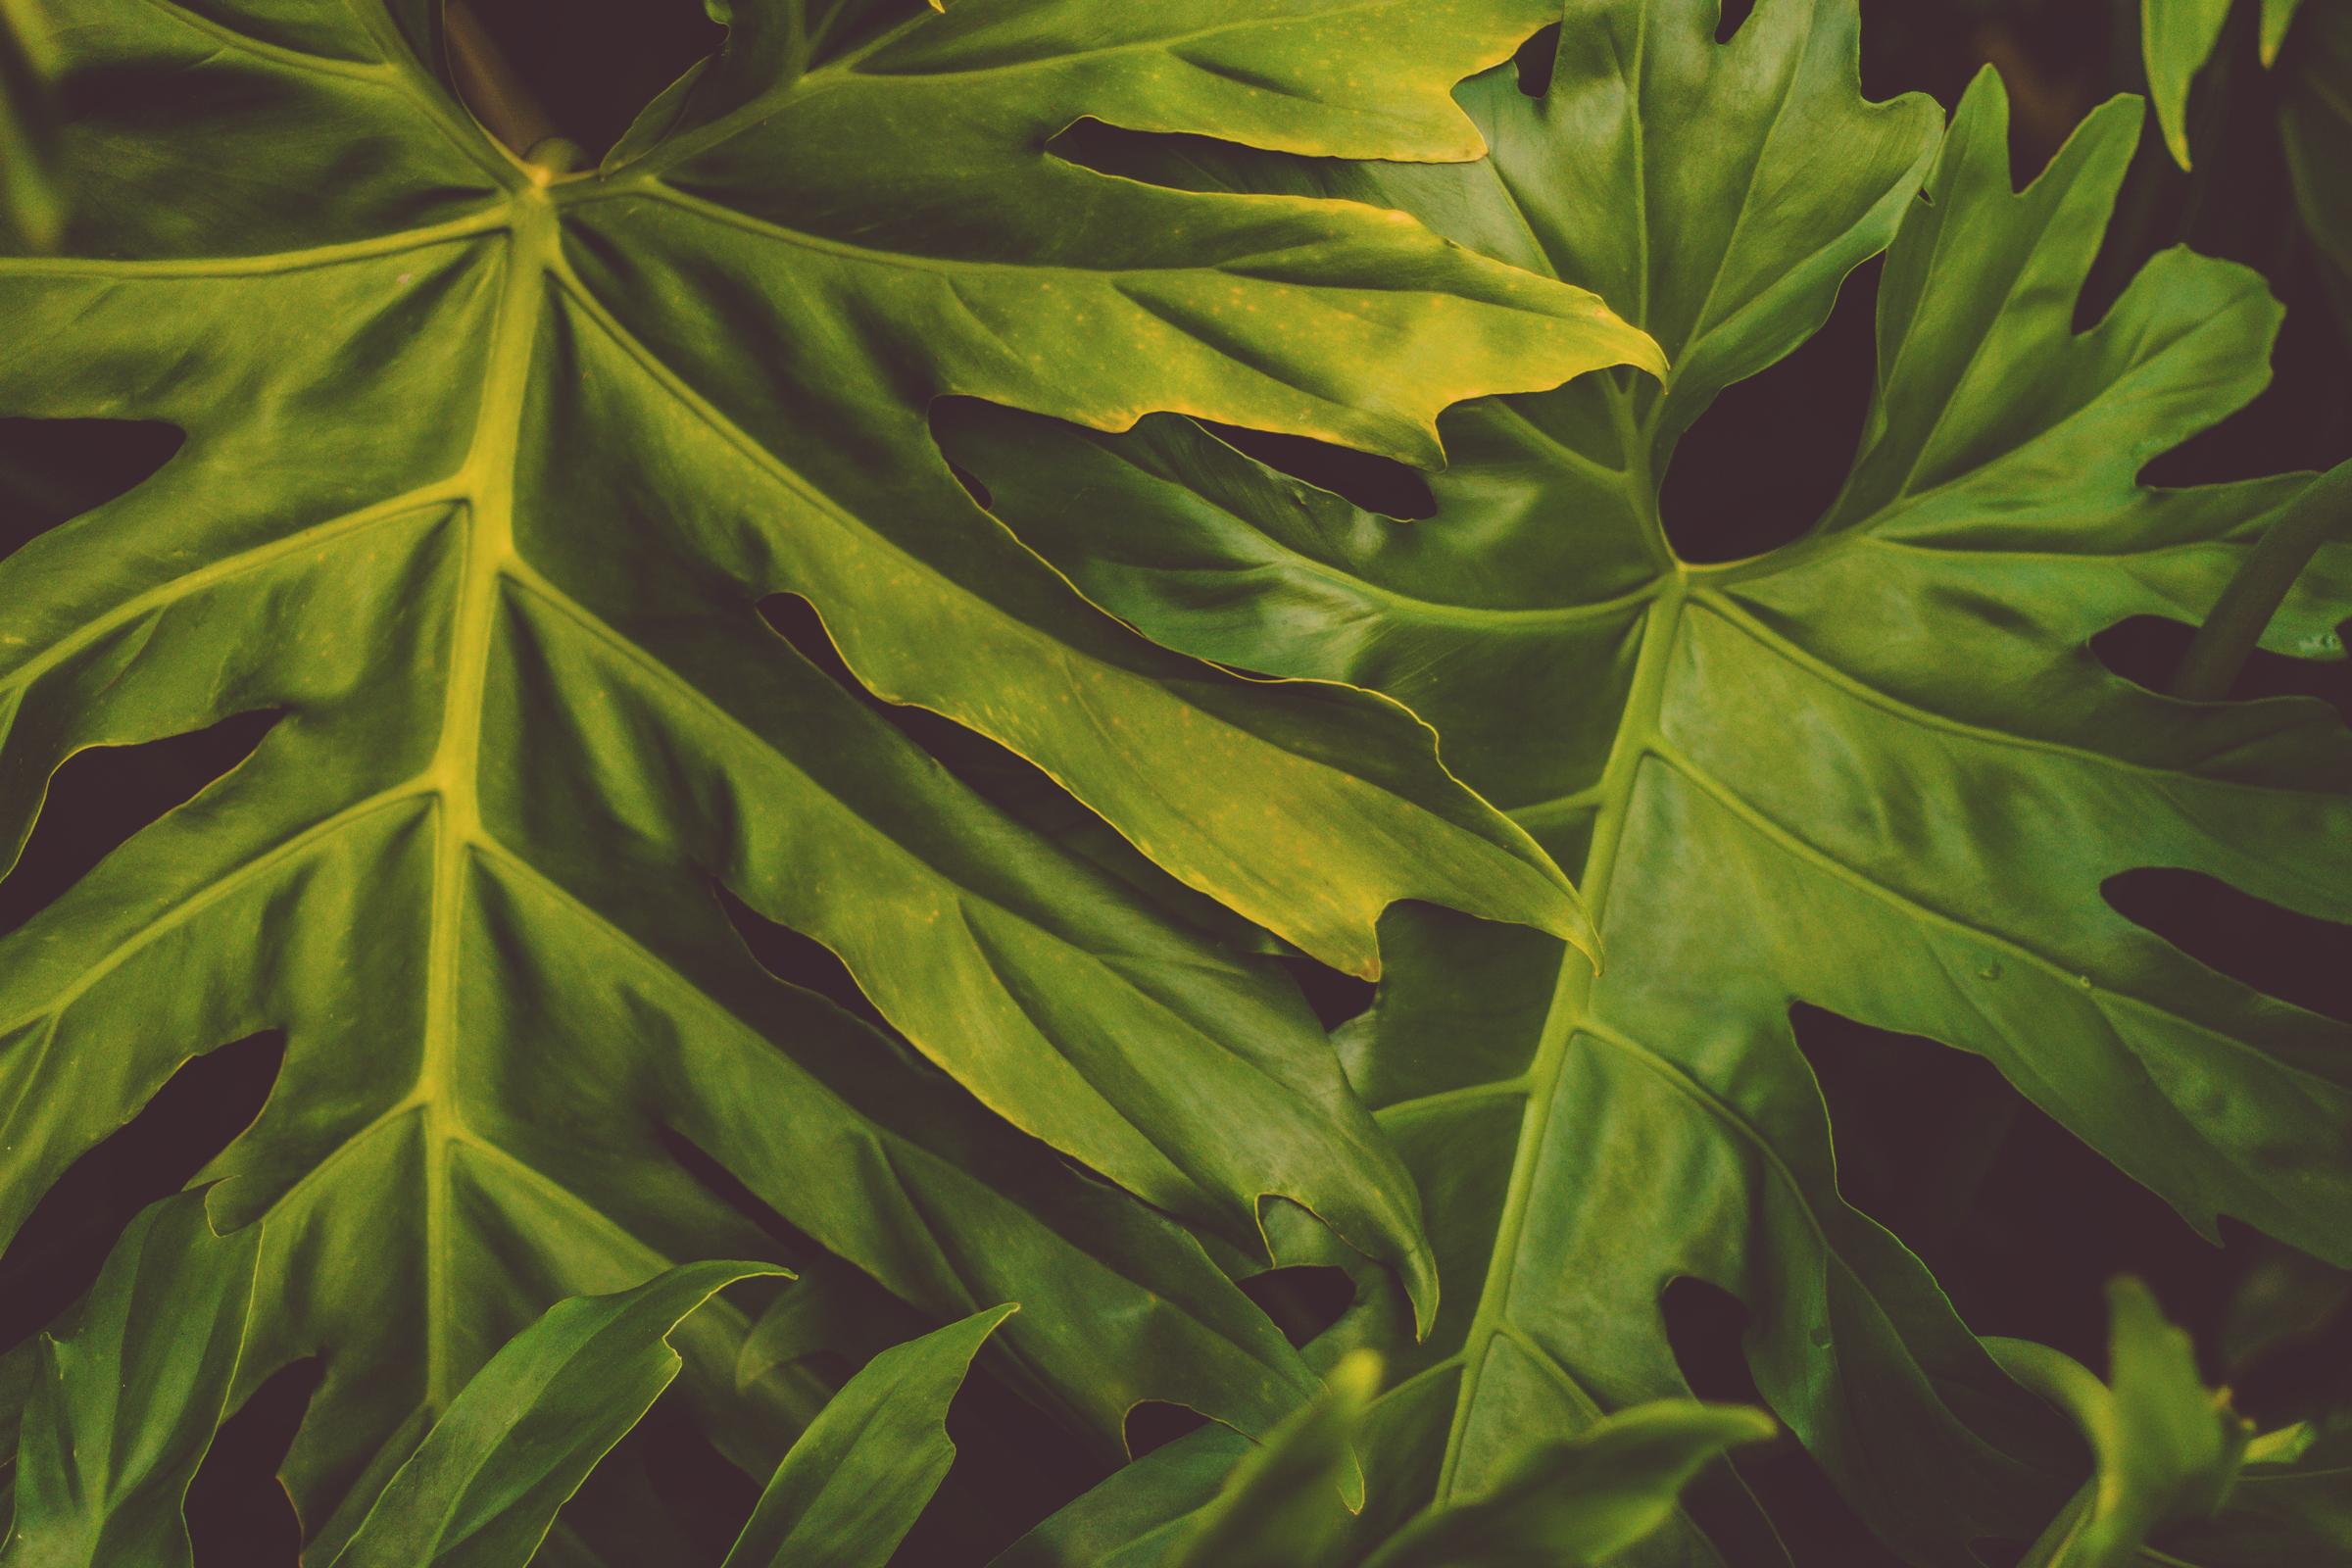 IMG_0313--KAUAI-HAWAII-JENNIFER-PICARD-PHOTOGRAPHY.jpg